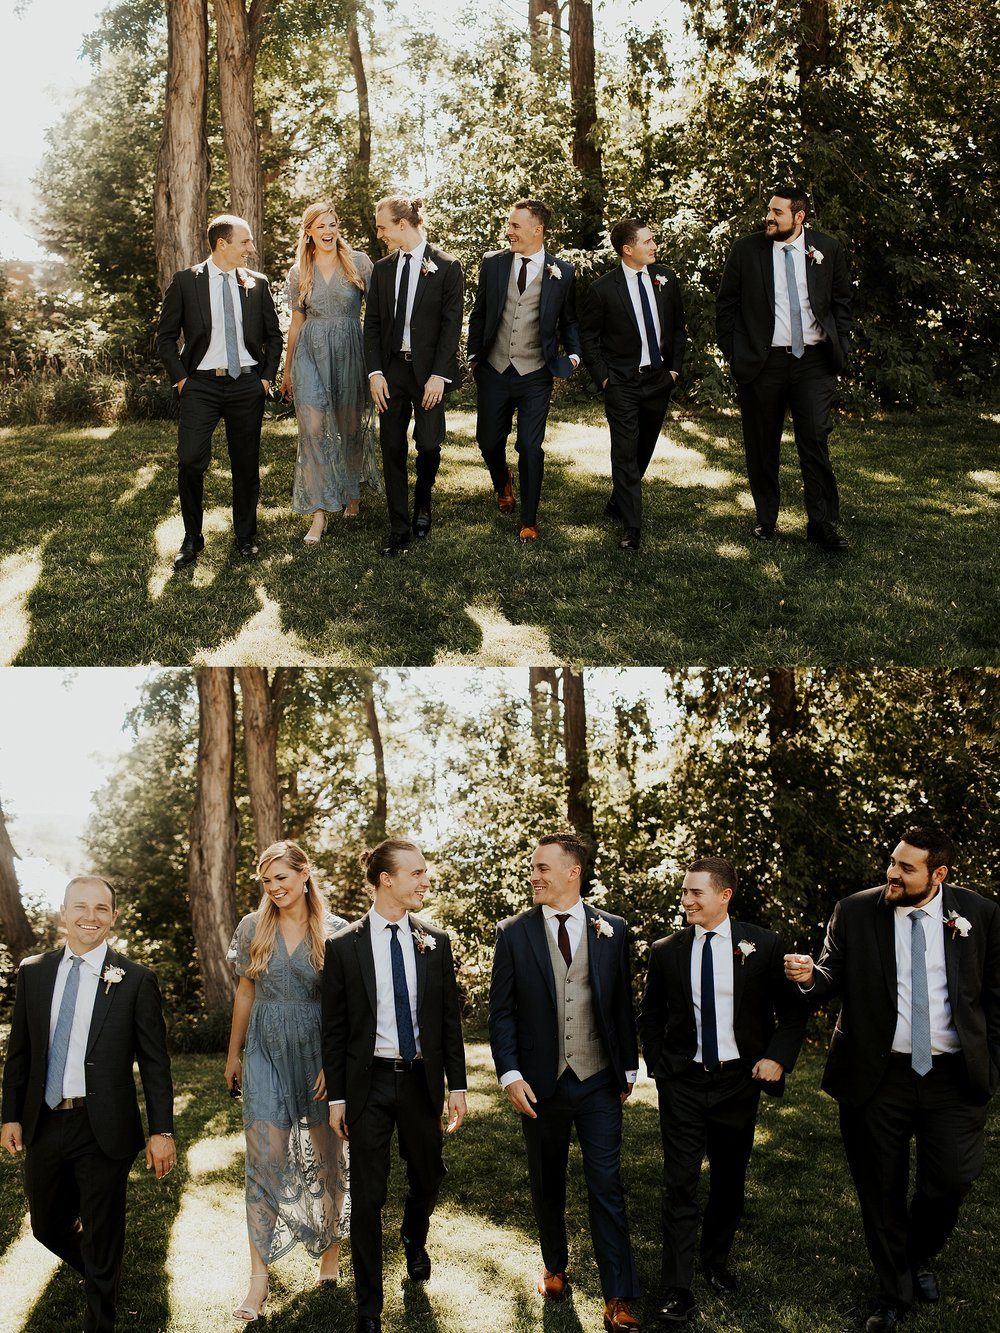 Lyons_Farmette_Wedding_Denver_Colorado_wedding019.JPG